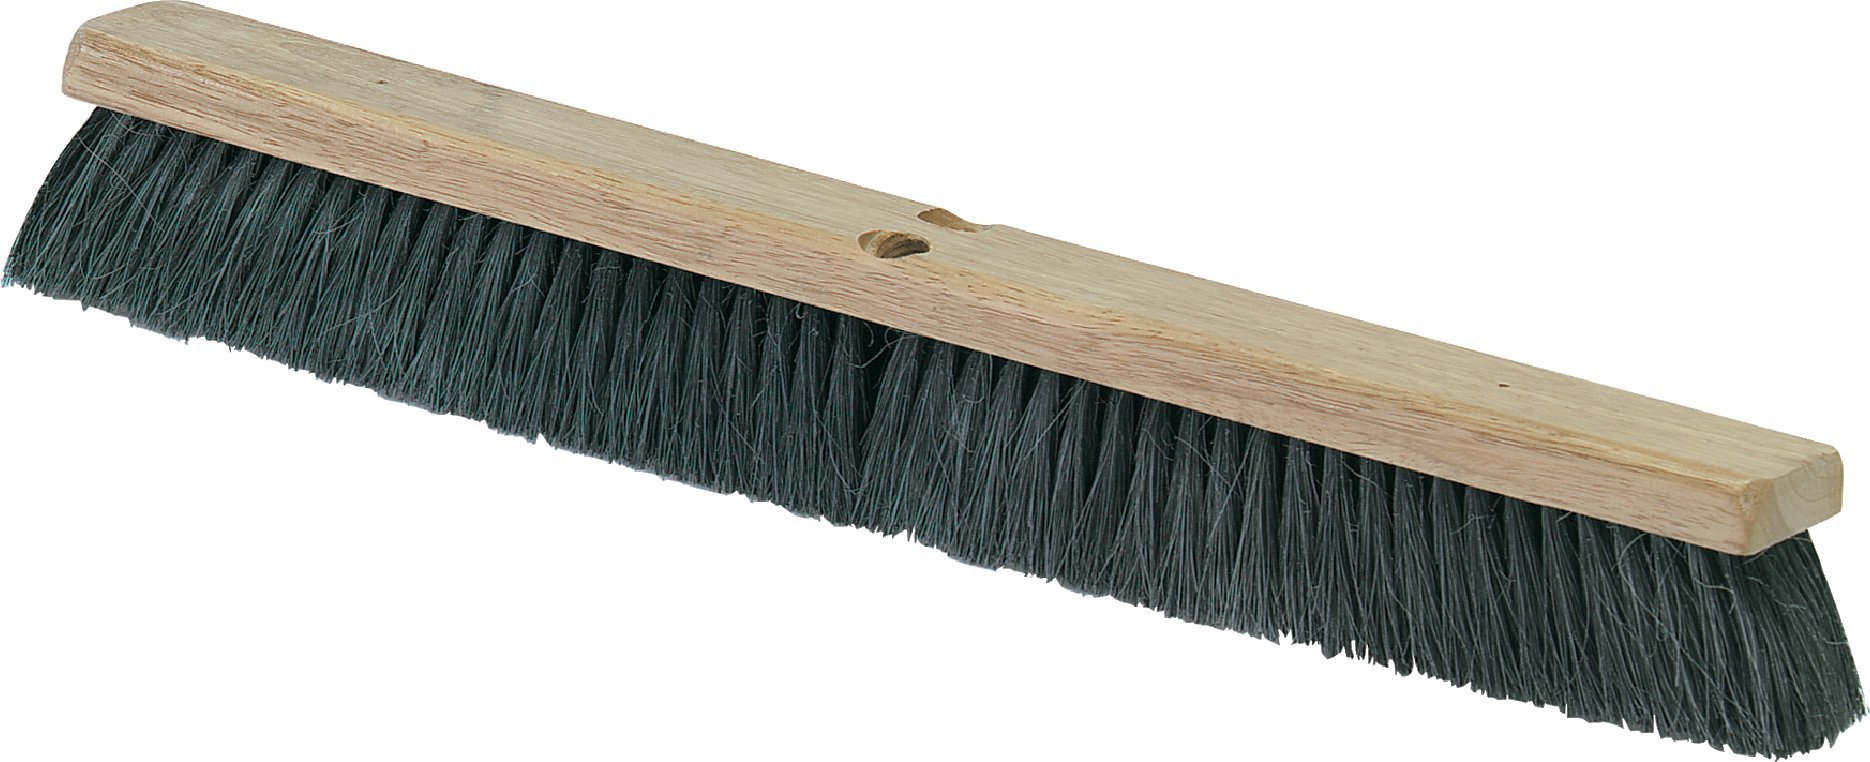 Carlisle 3621923603 Flo-Pac Hardwood Block Floor Sweep, Tampico Bristles, 36'' Block Size, 2-1/2'' Bristle Trim, Black (Pack of 6)